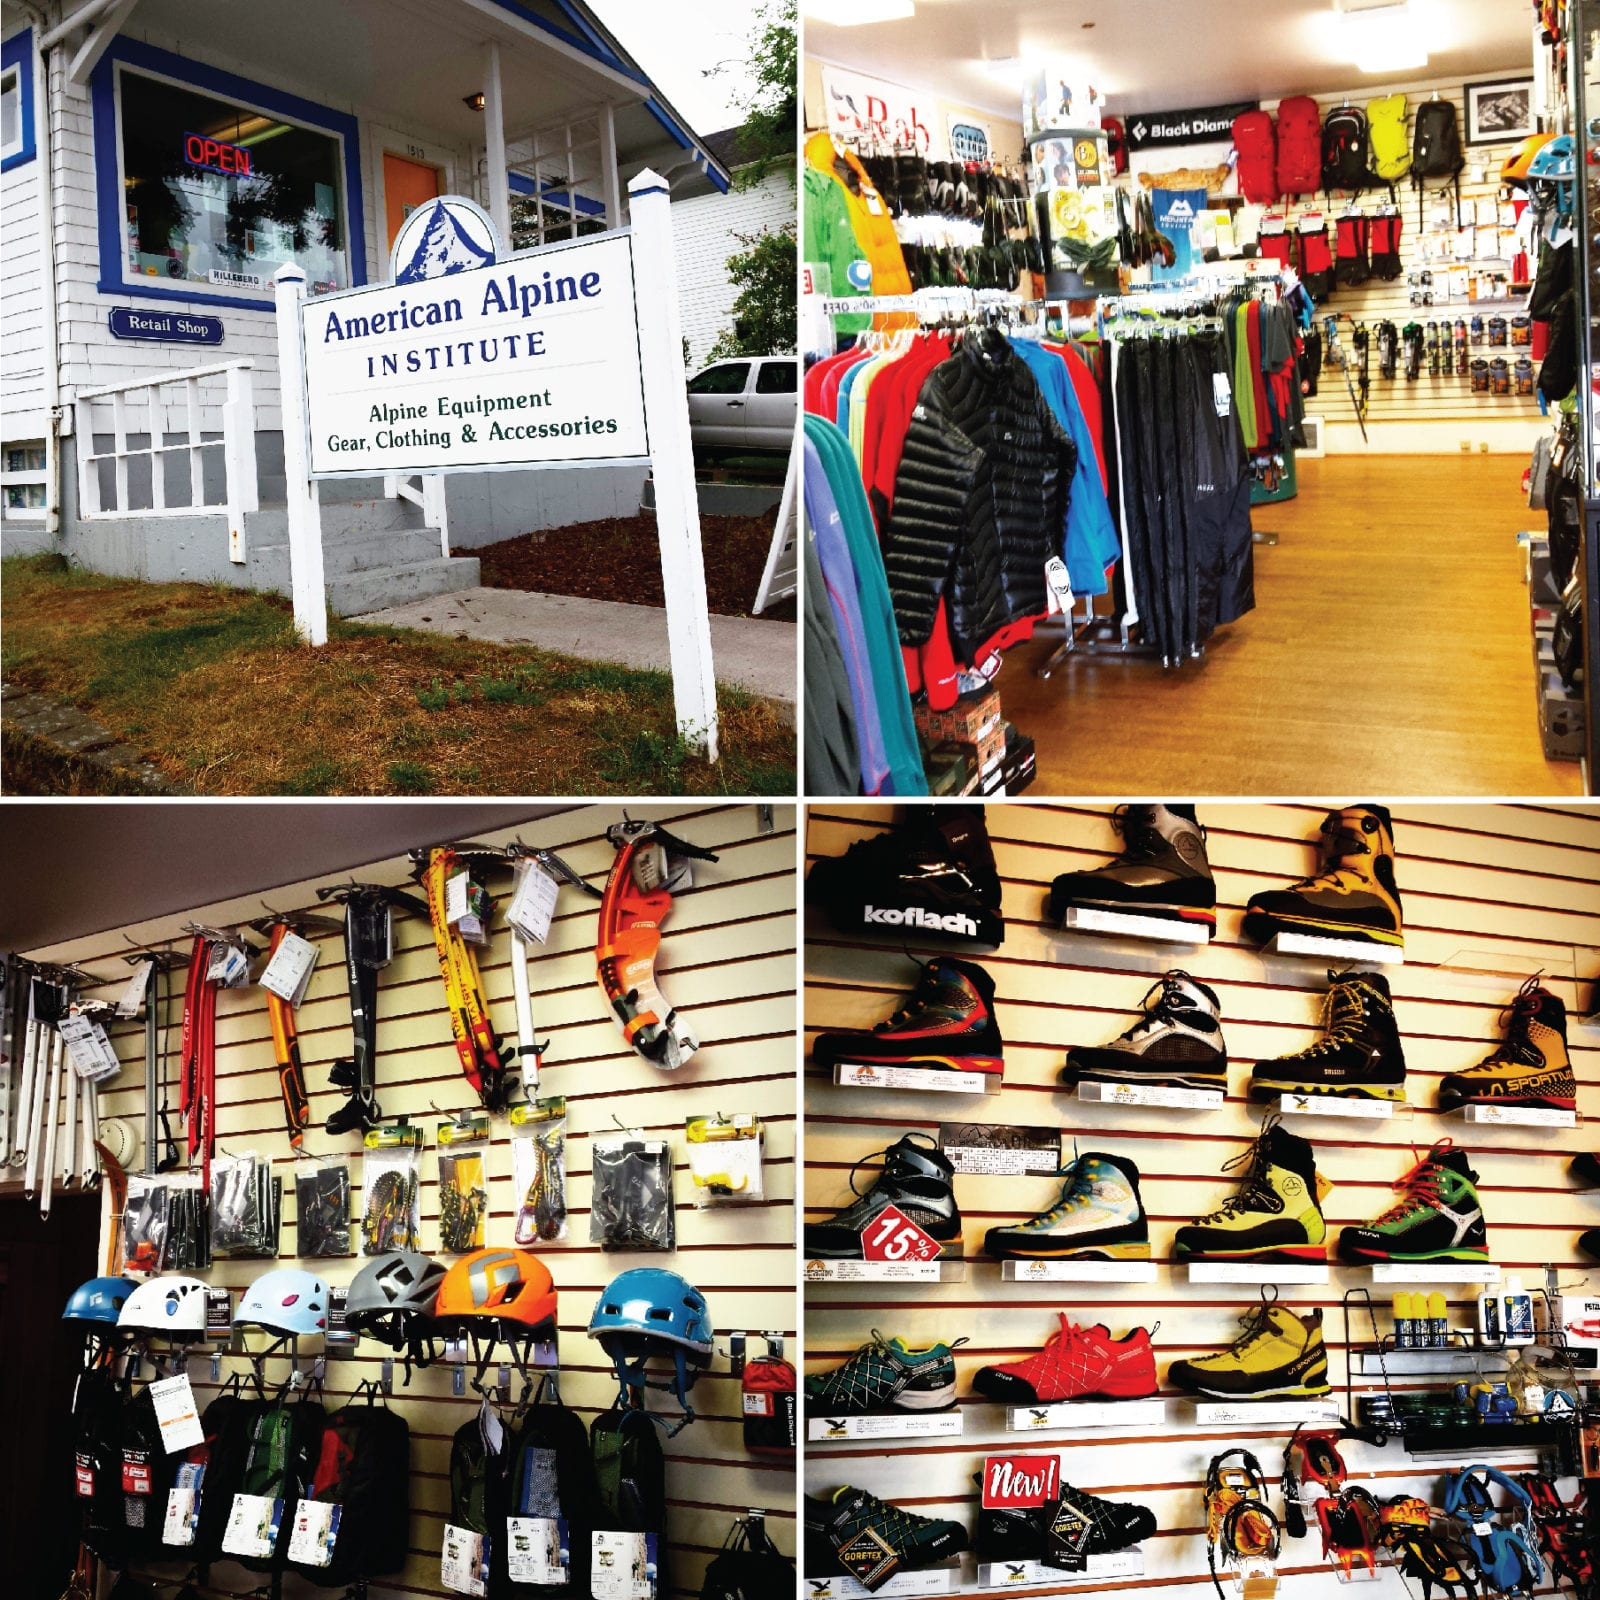 American Alpine Institute, Equipment Shop, climbing gear, outdoor retailer, Bellingham